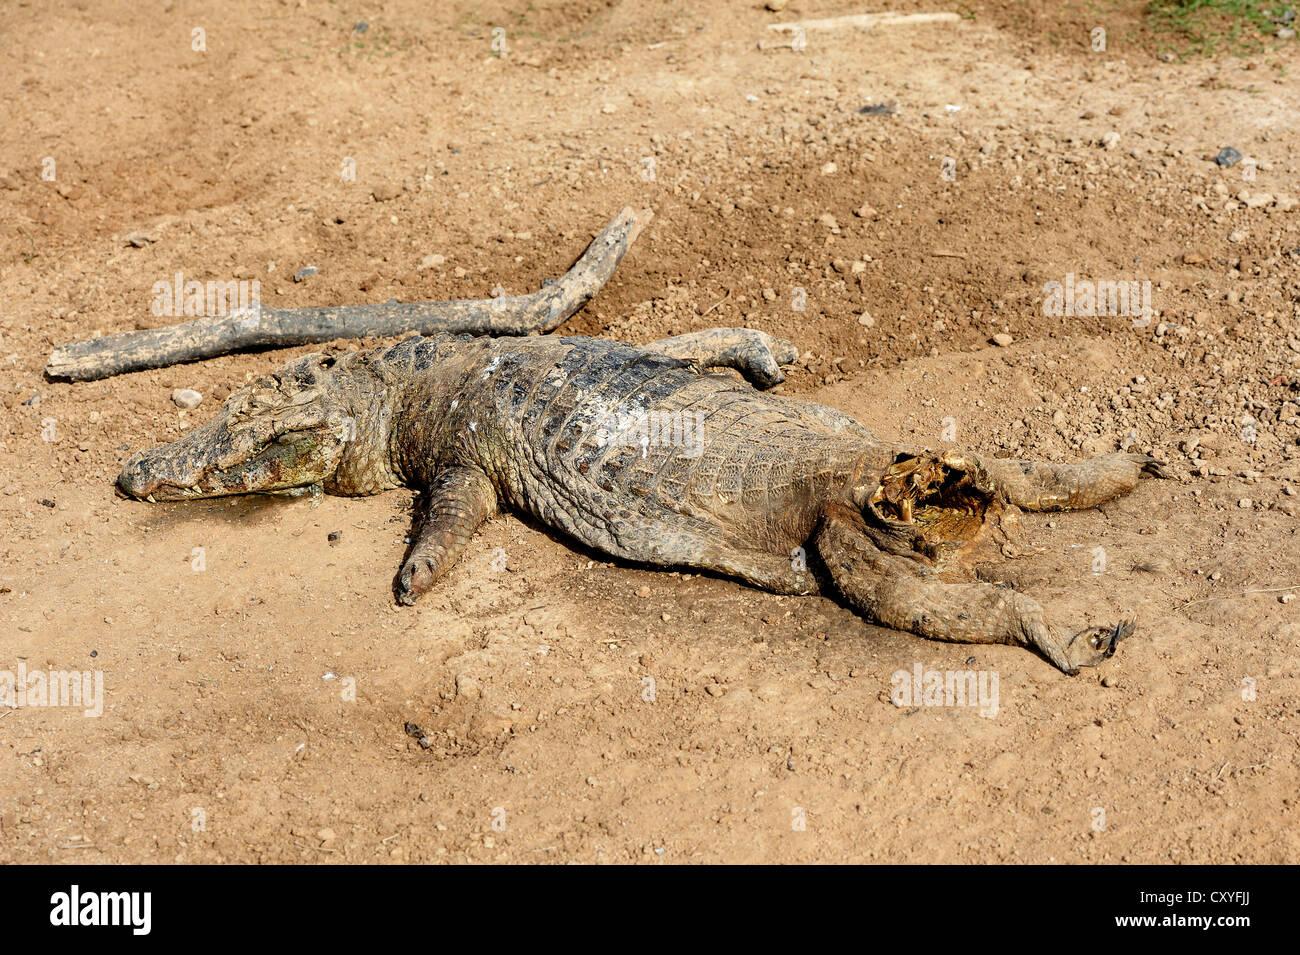 Yacare caiman (Caiman yacare) with a cut off tail, victim of sports hunters, Banado La Estrella, Formosa province, - Stock Image